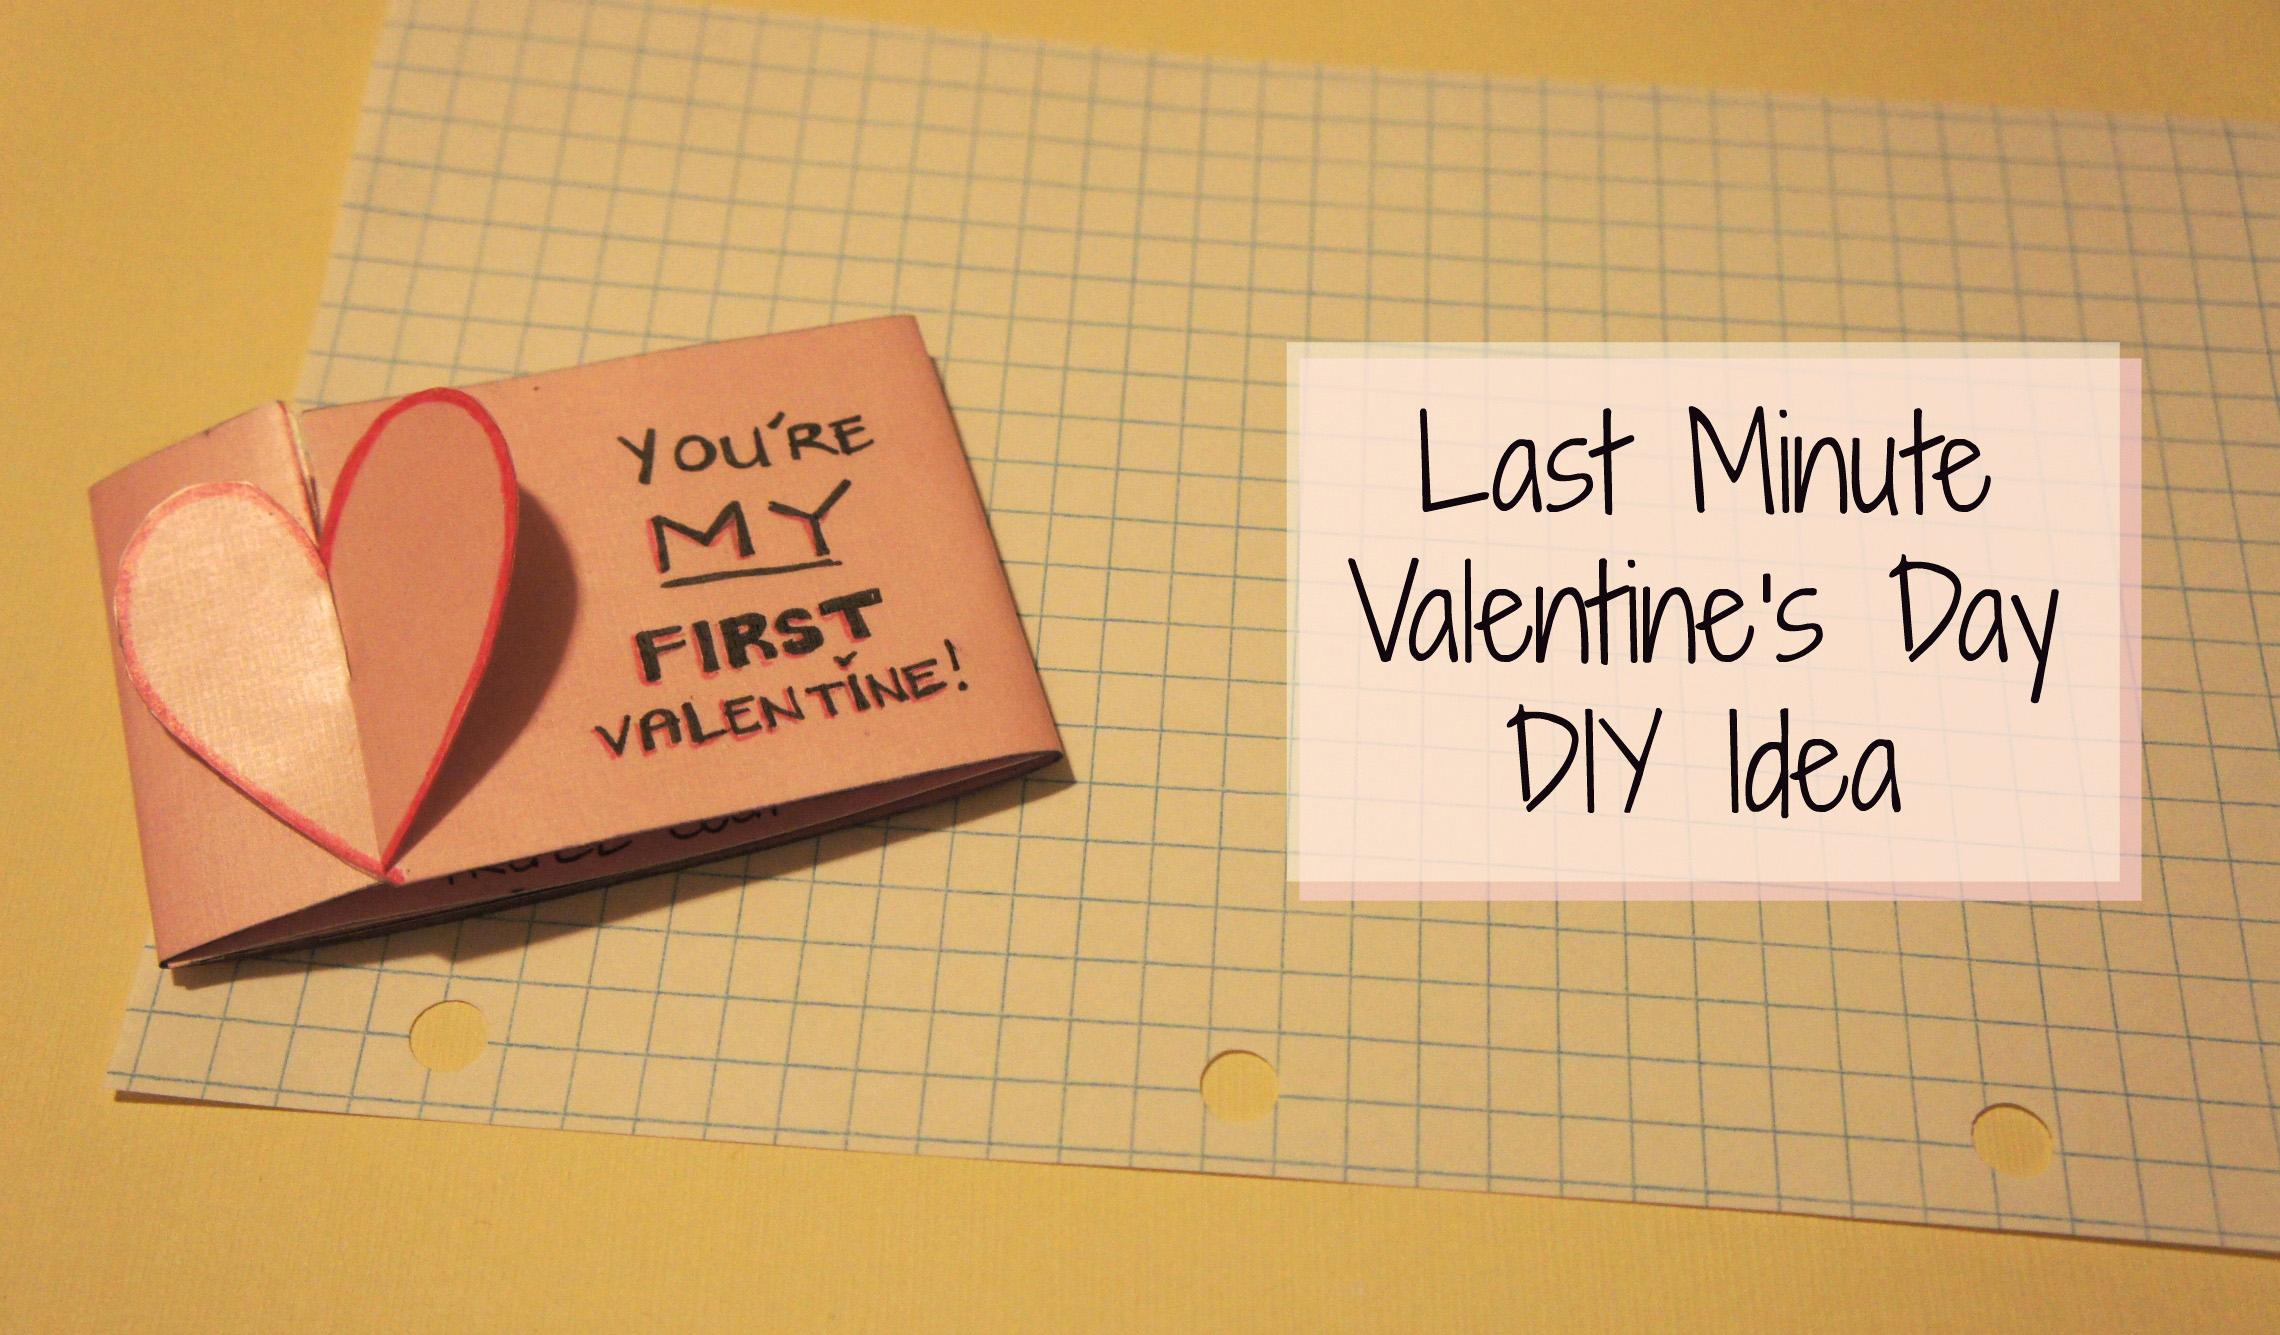 Last Minute Valentine's Day DIY Idea